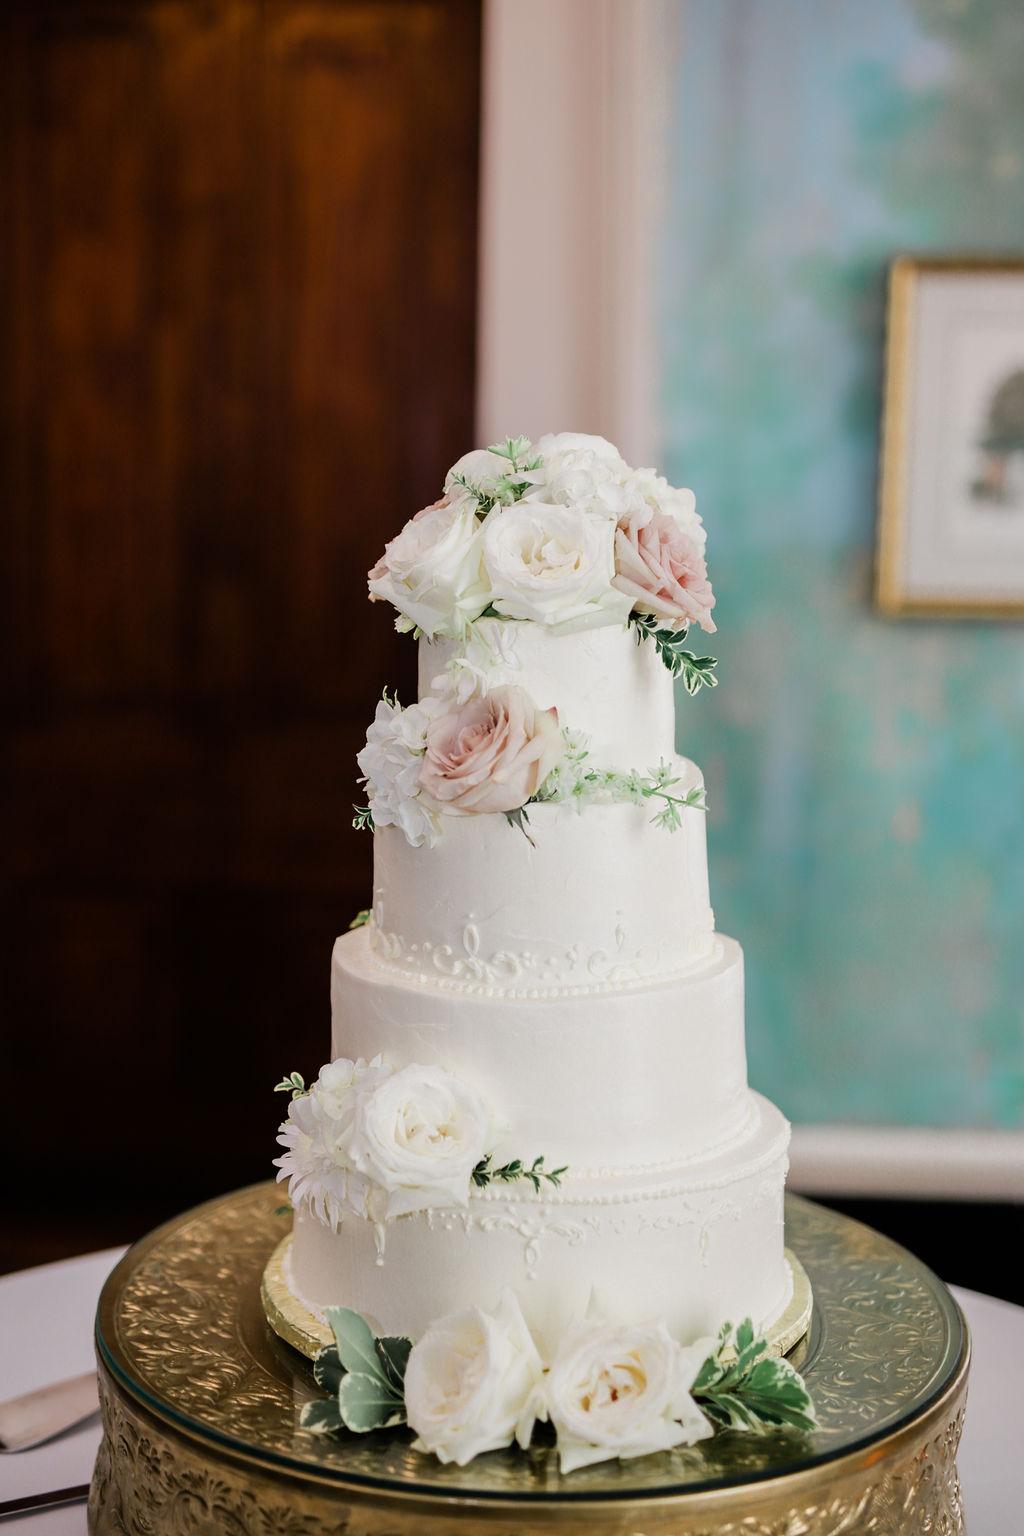 Pink and white wedding cake with flowers: Wedding portrait by Nashville wedding photographer Maria Gloer Photography